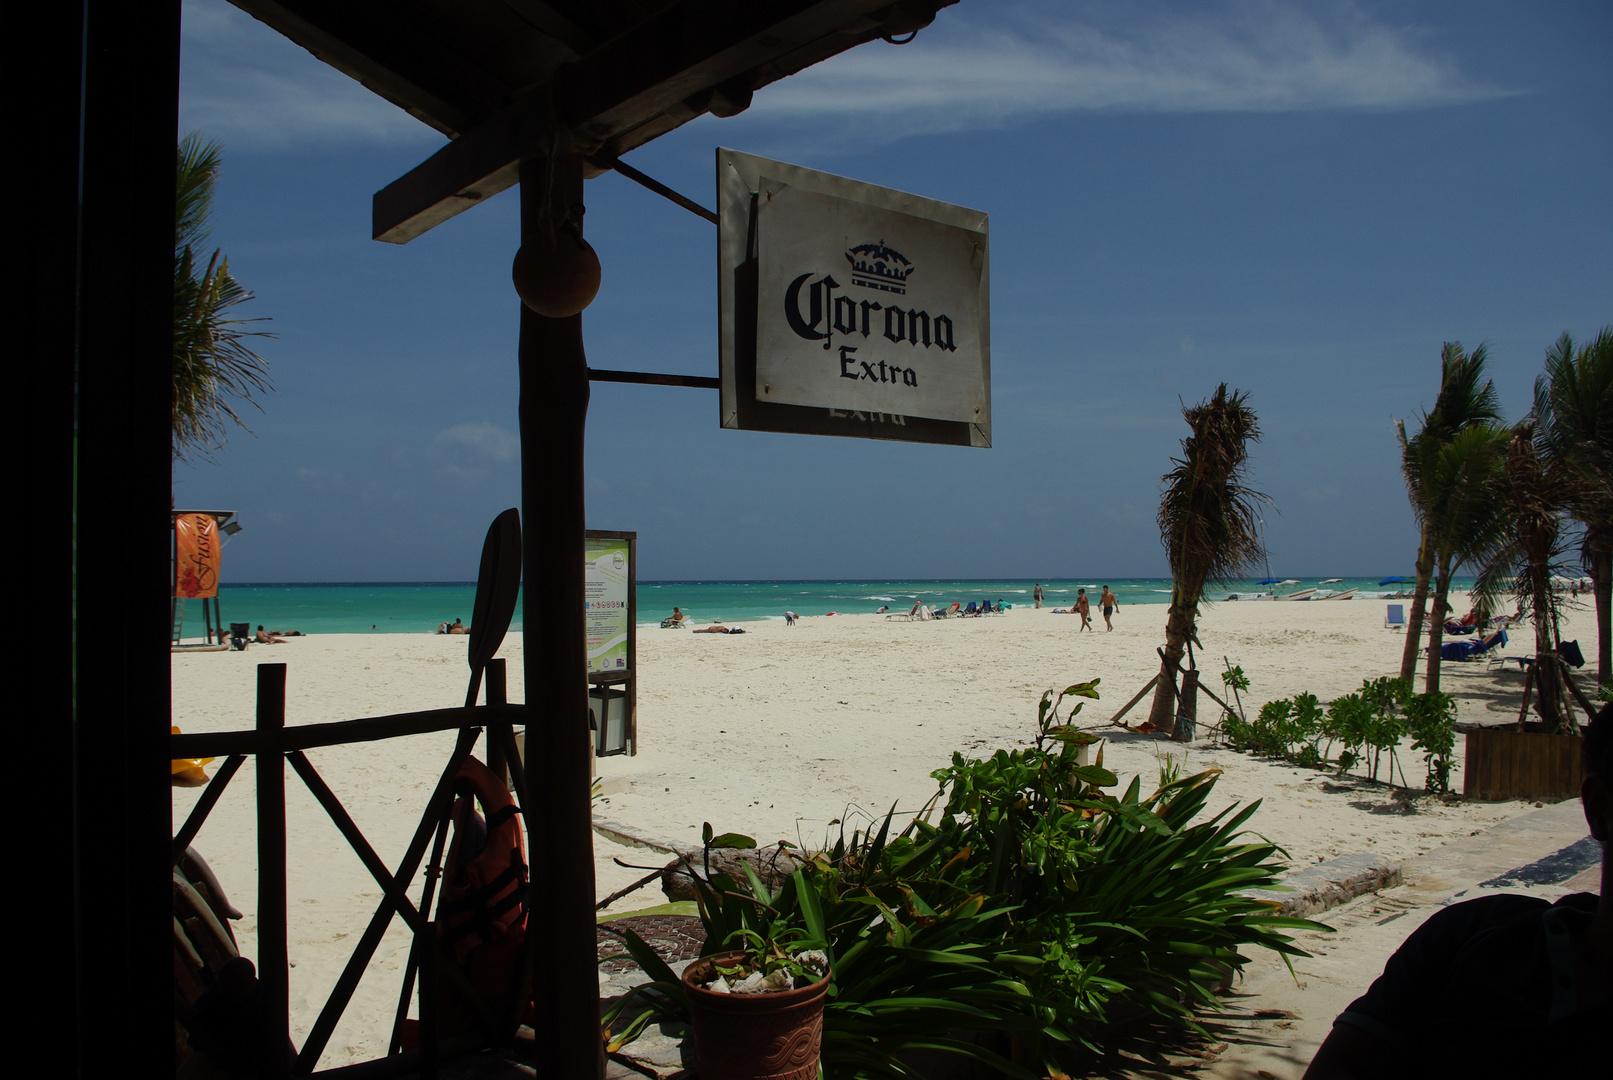 Corona - Caribic dreams